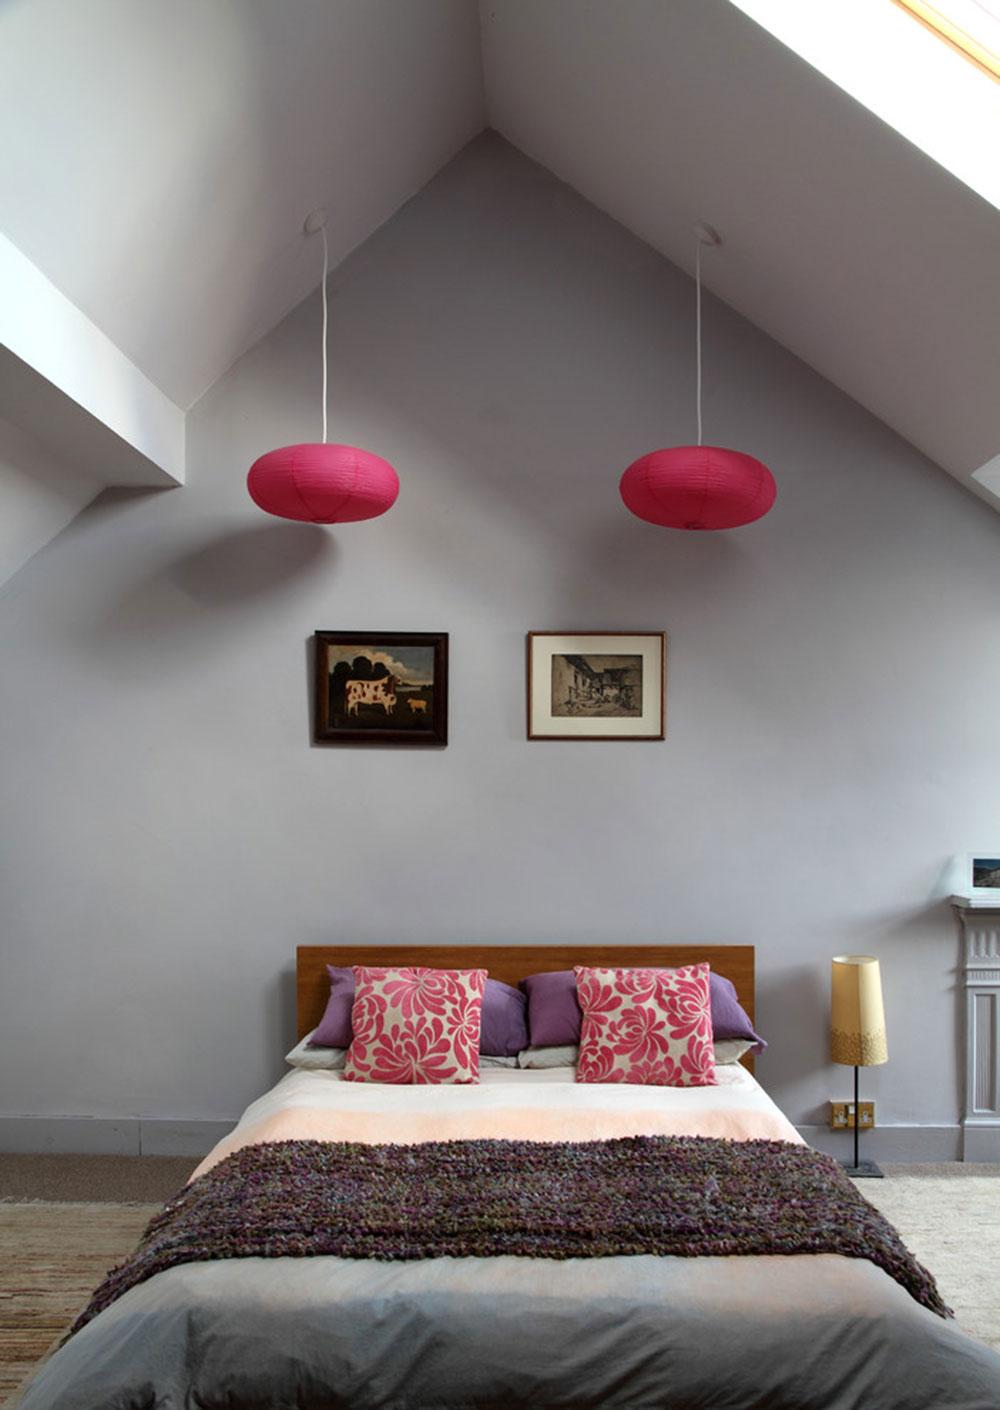 Bedroom-lighting-tips-and-pictures-6 Bedroom-lighting tips and pictures